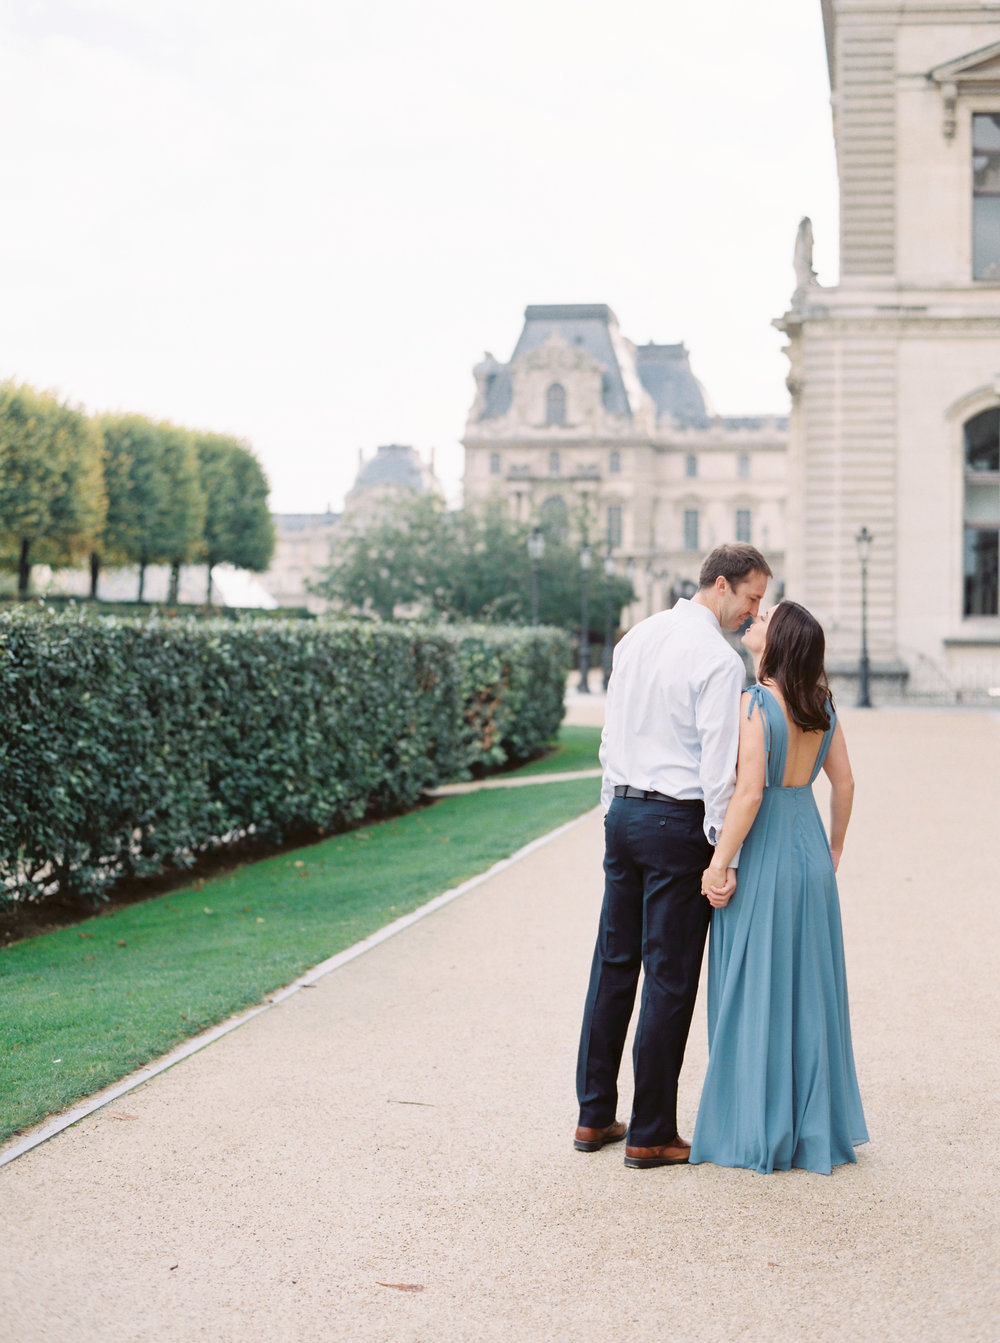 paris-france-wedding-photographer-destination-photographer-100.jpg